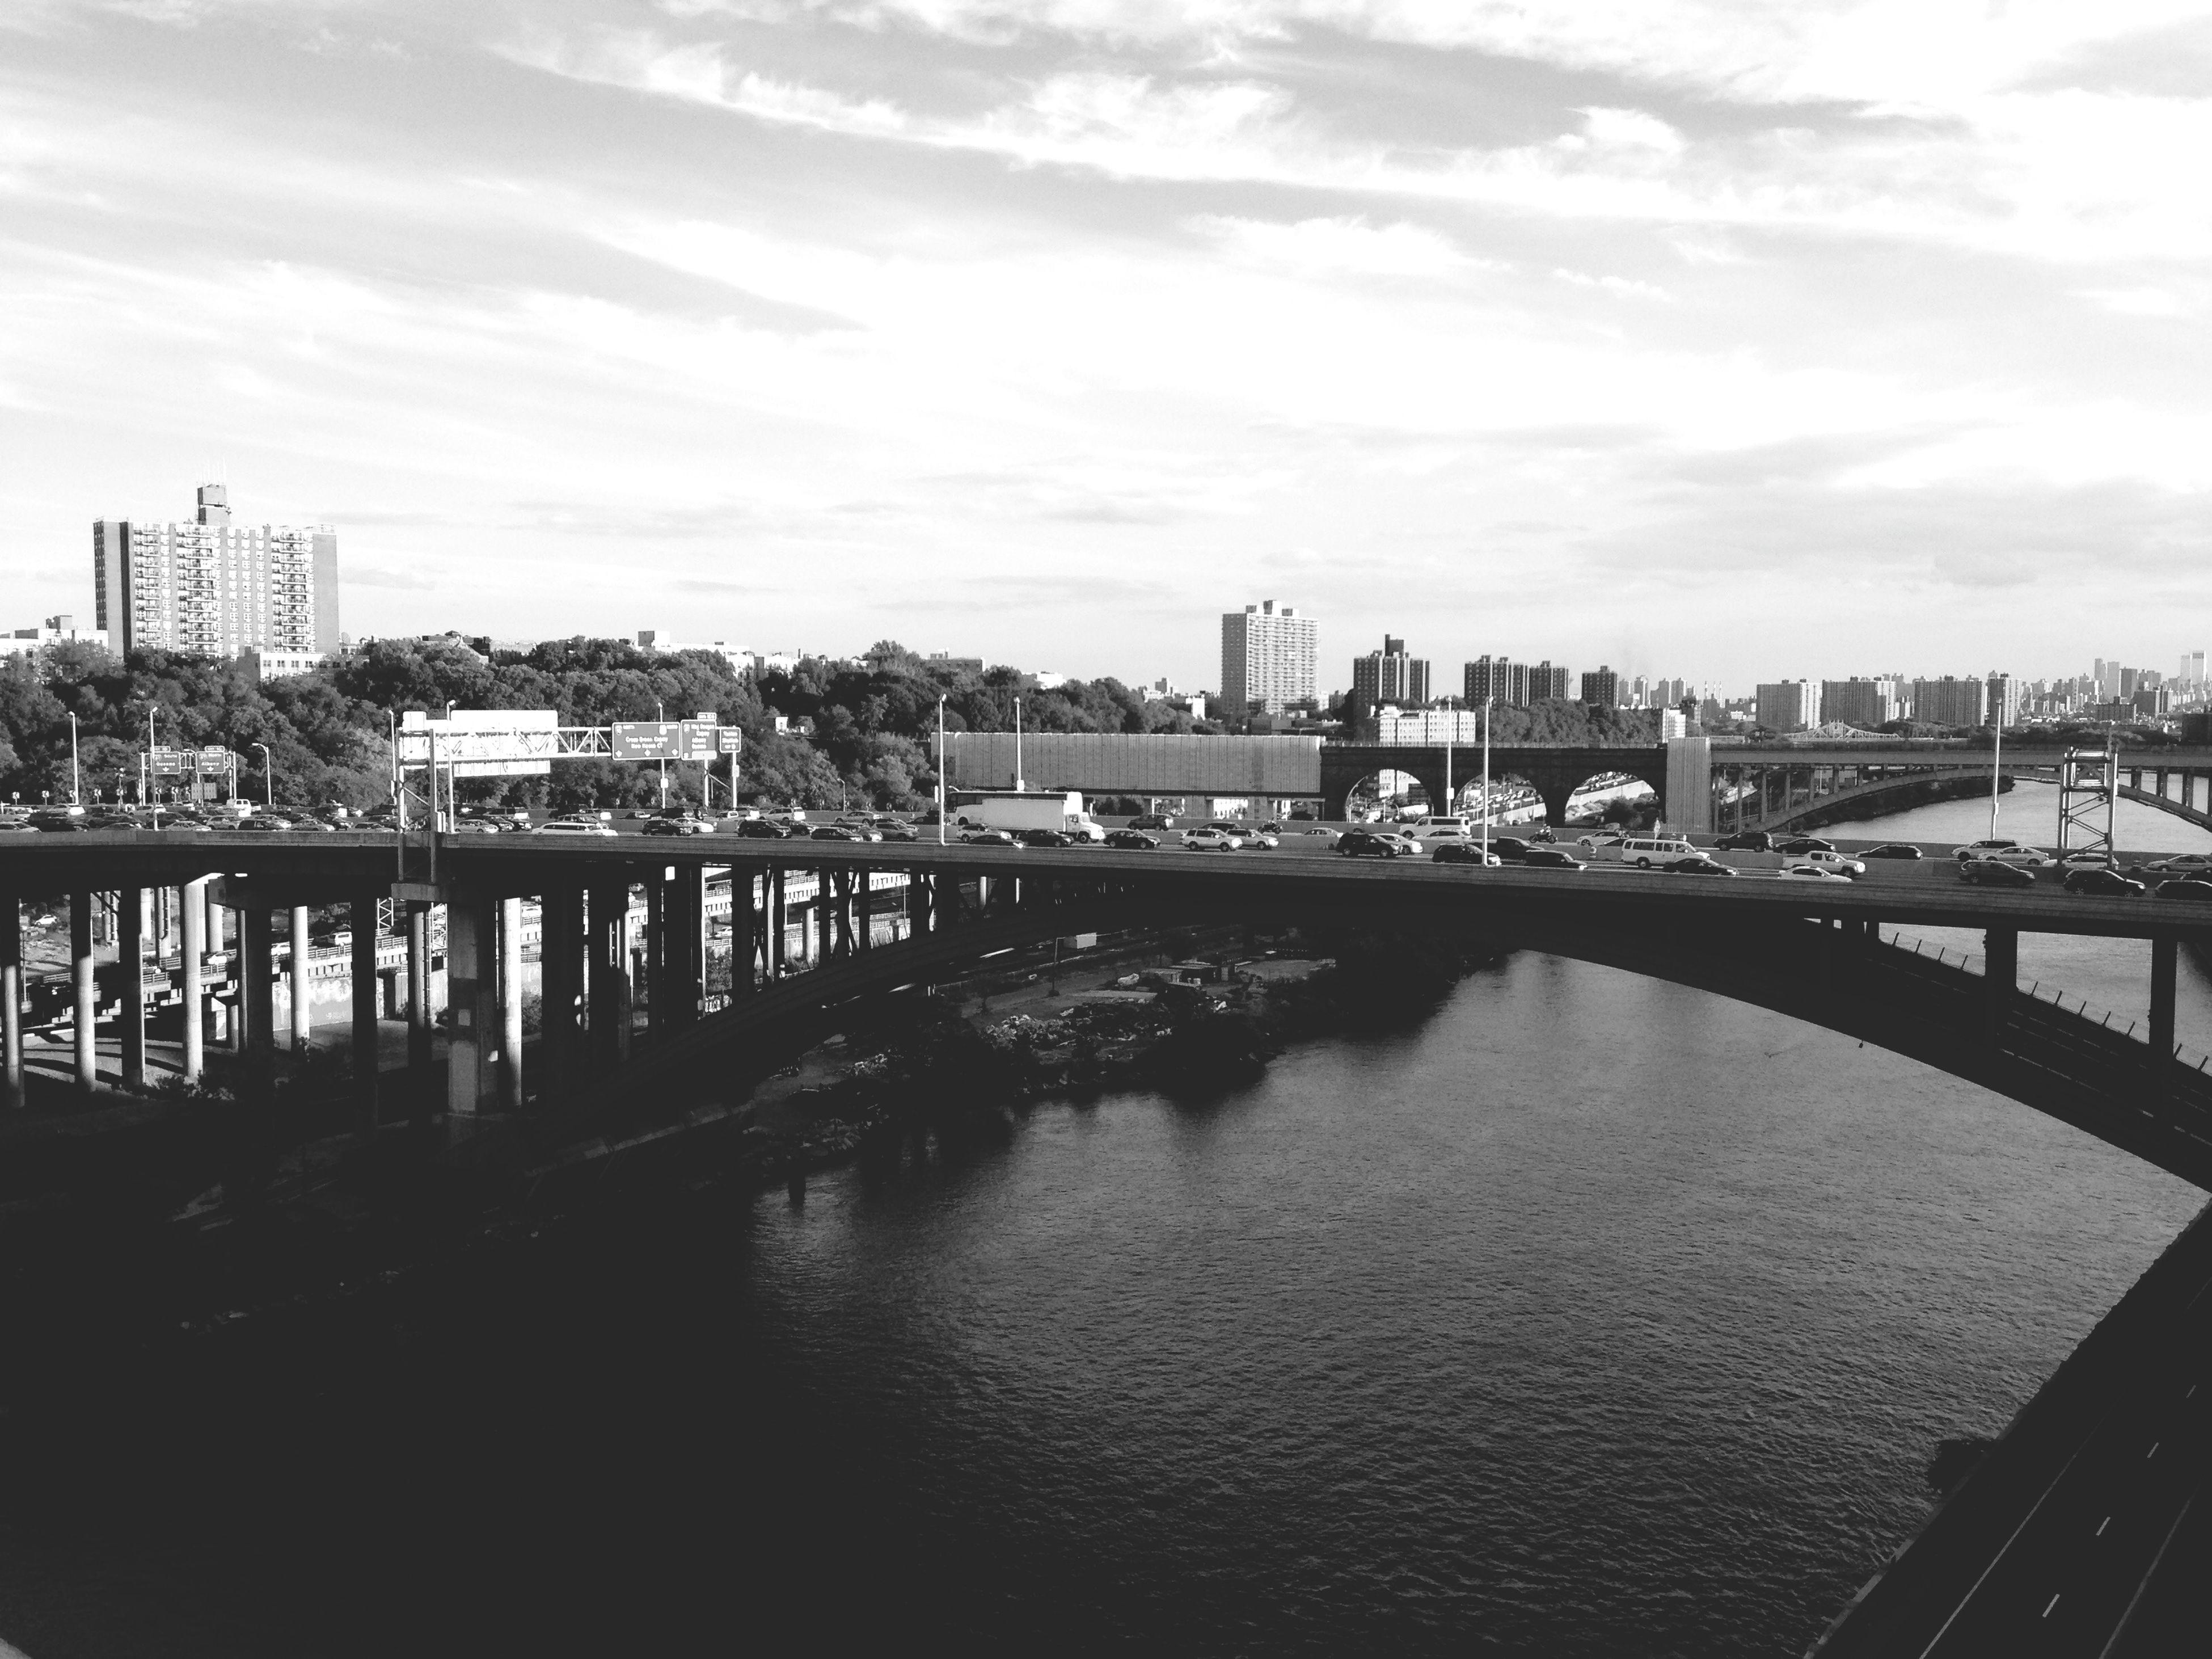 architecture, built structure, building exterior, city, water, river, bridge - man made structure, sky, connection, cityscape, waterfront, cloud - sky, transportation, bridge, cloud, railing, city life, engineering, outdoors, skyscraper